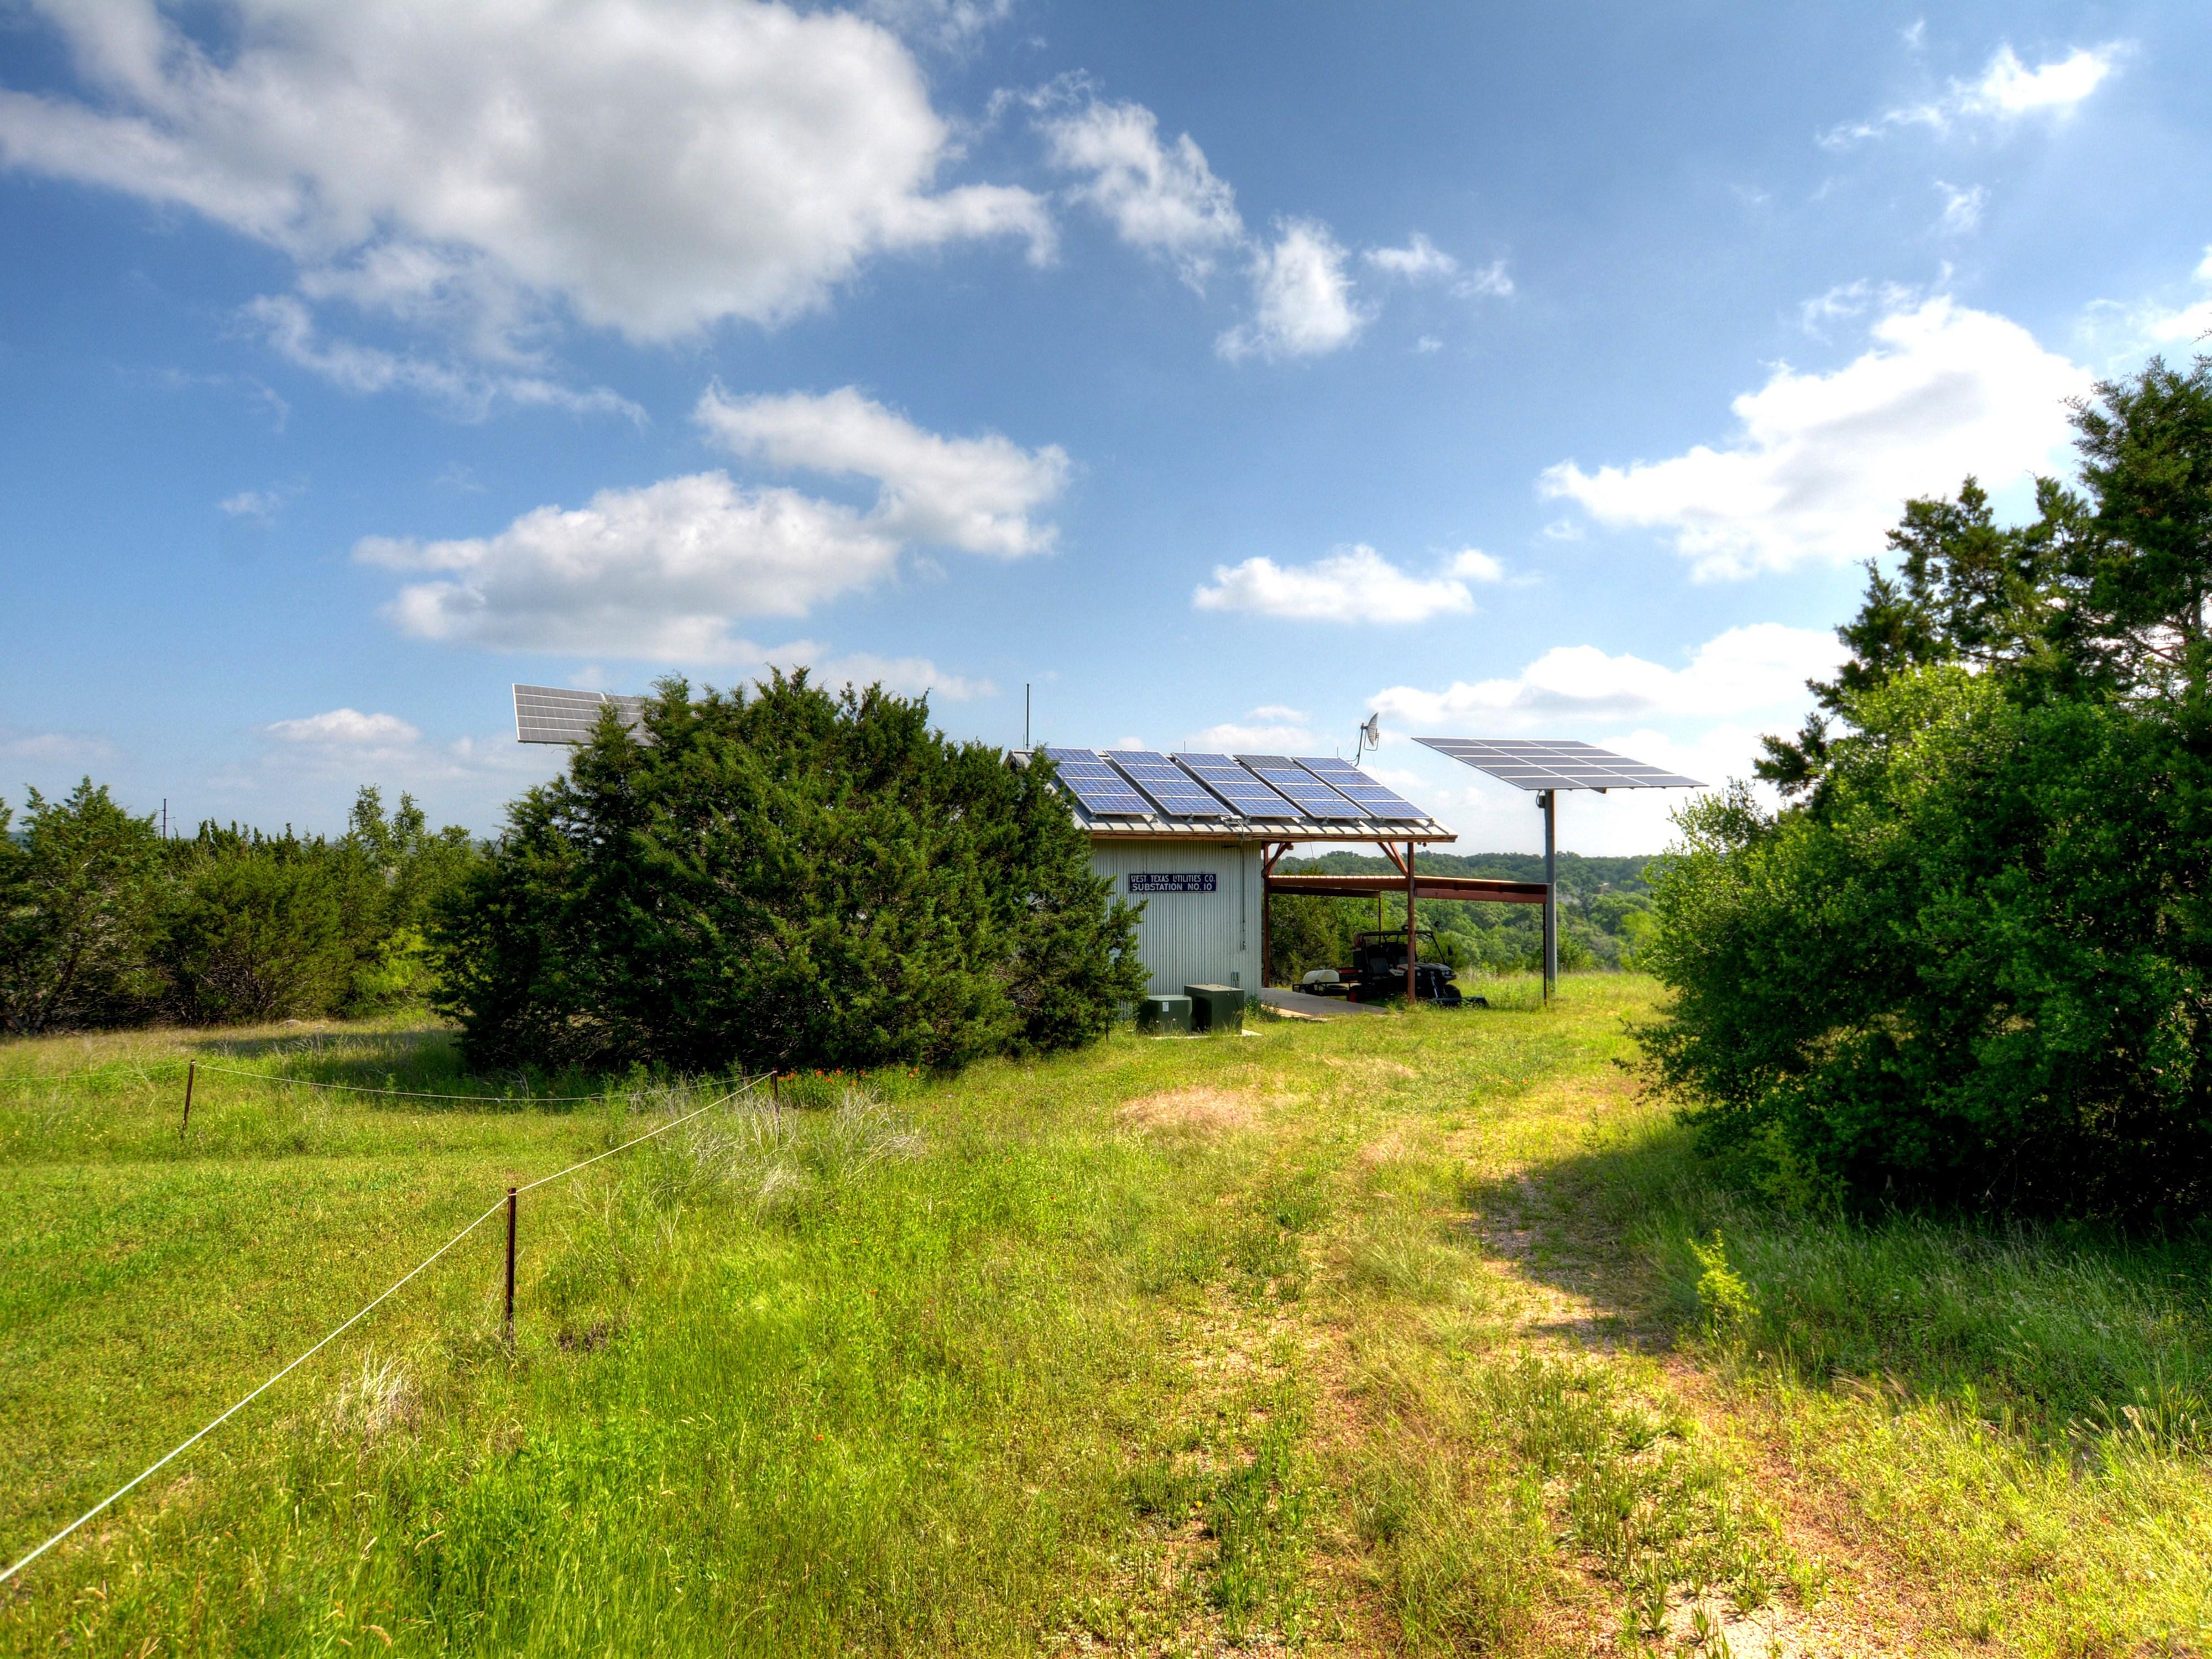 033_Solar Farm